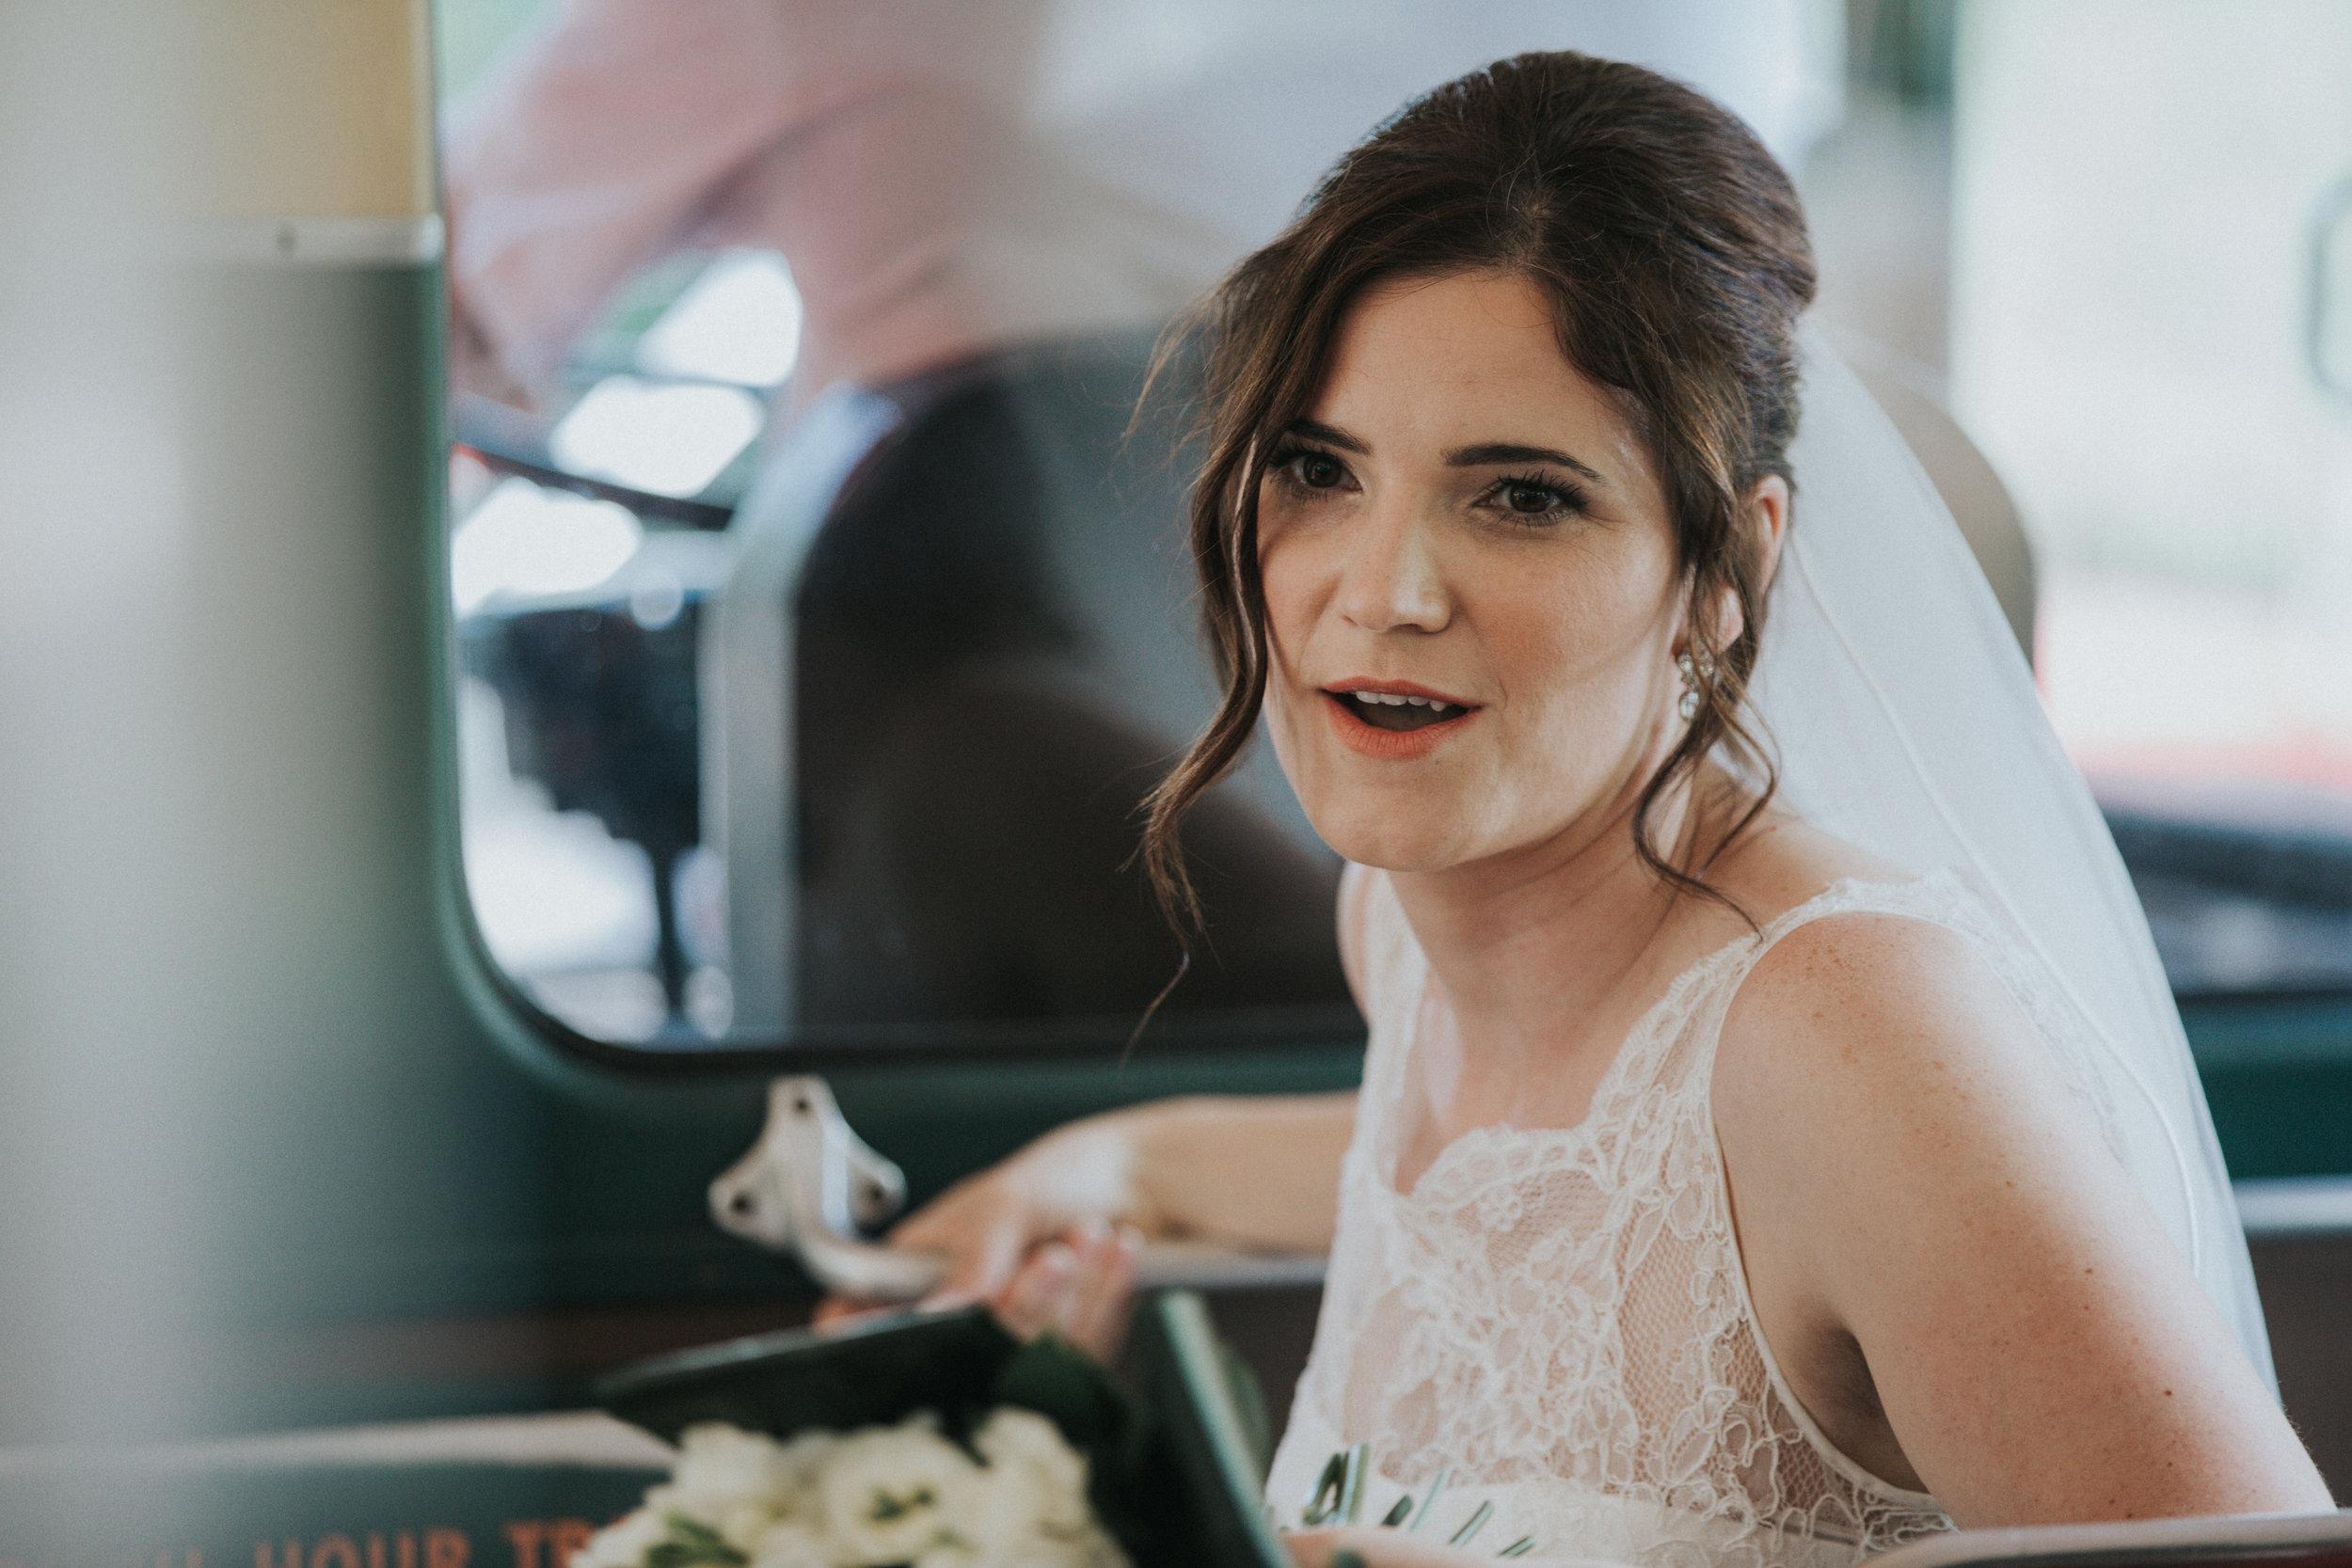 reigate-surrey-london-wedding-photography-bridal-prep-bus-25